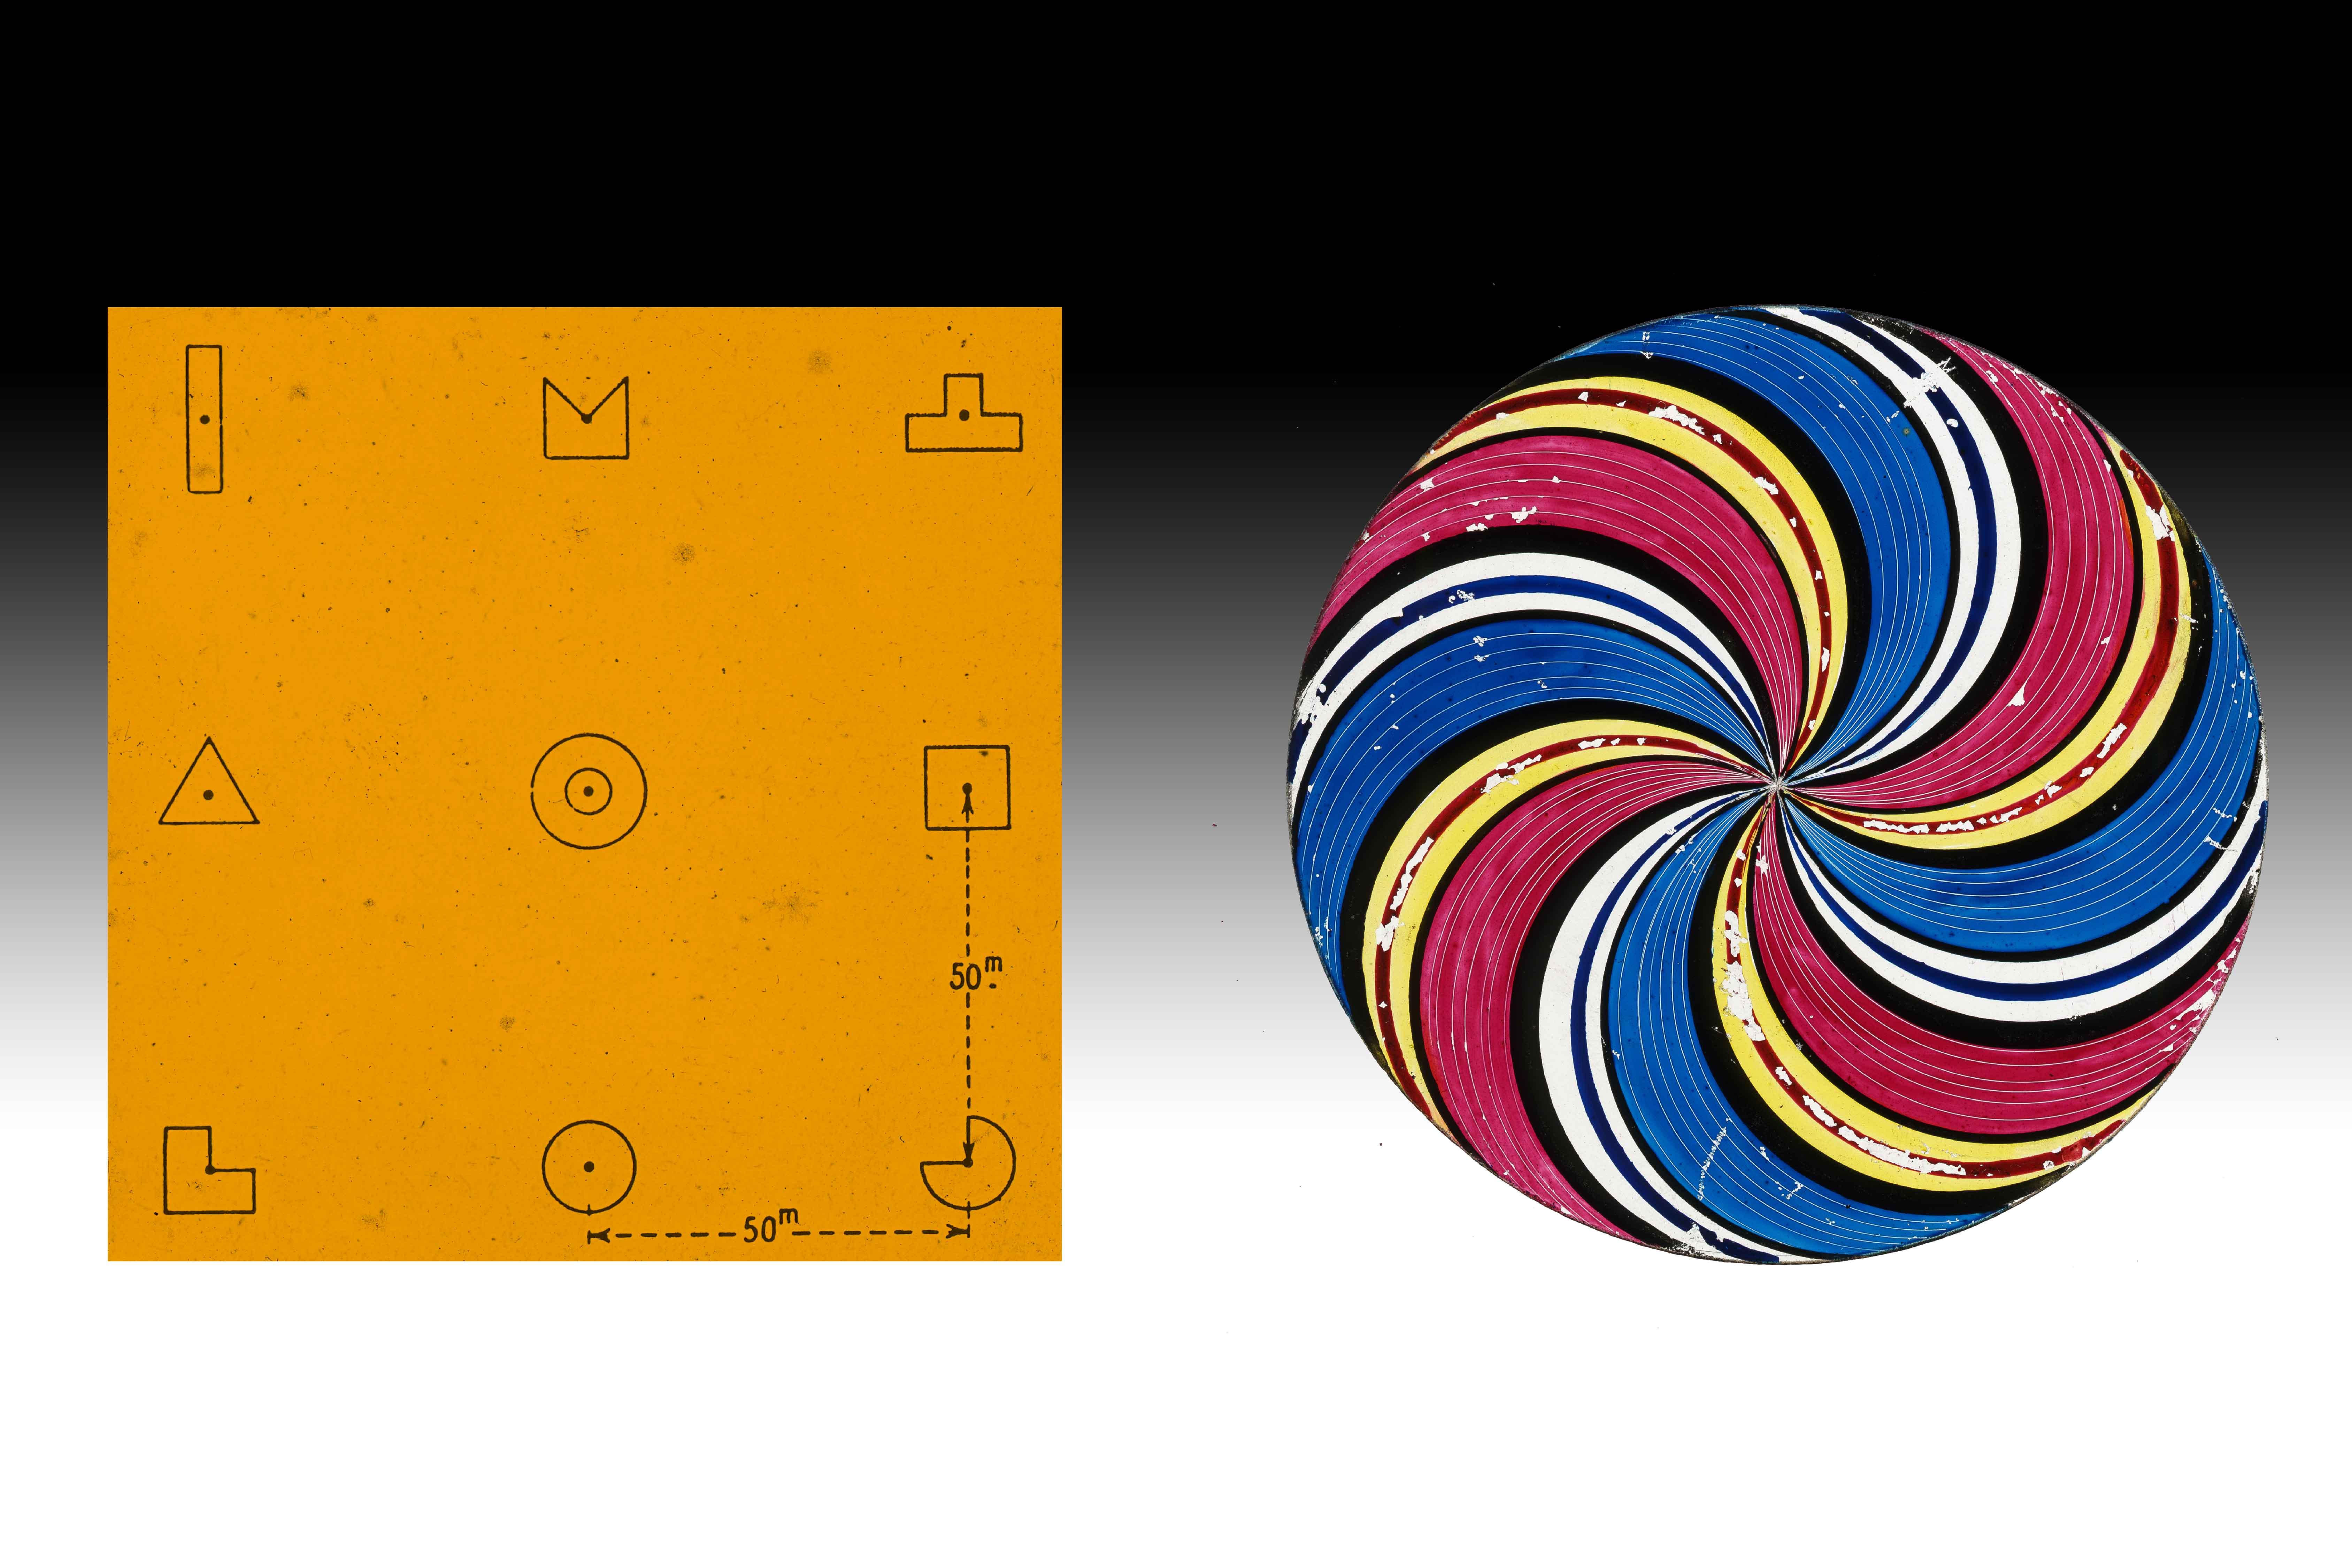 Simple Shapes -Orange square